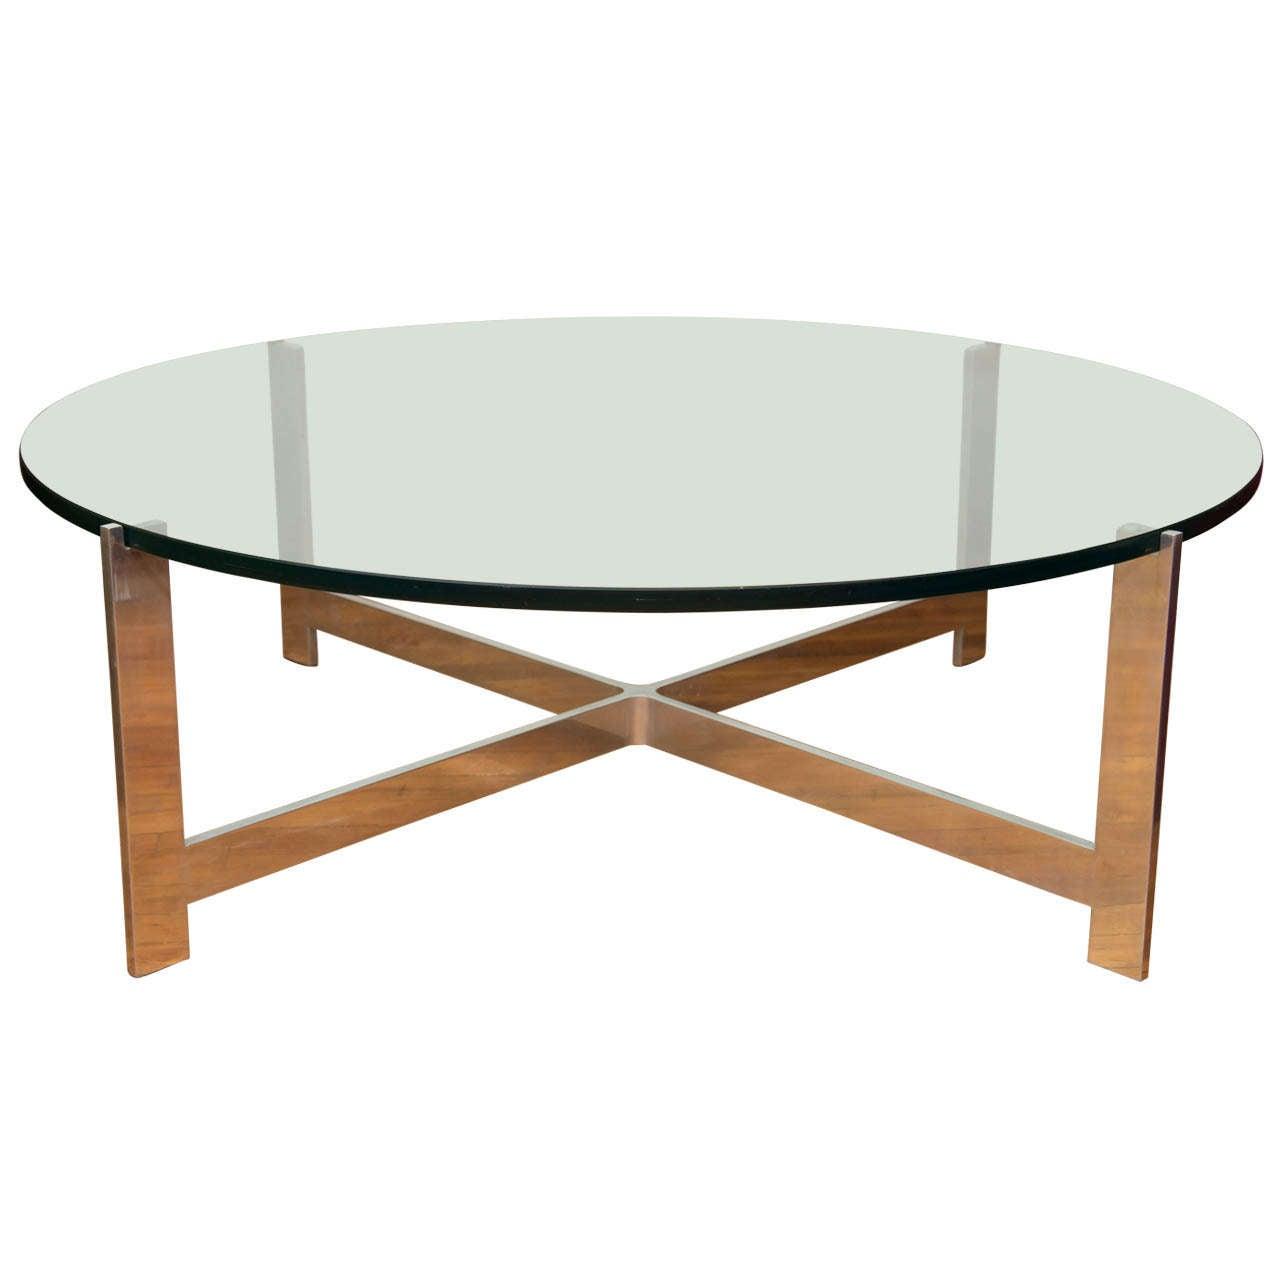 Baughman Round Chrome Base Coffee Table